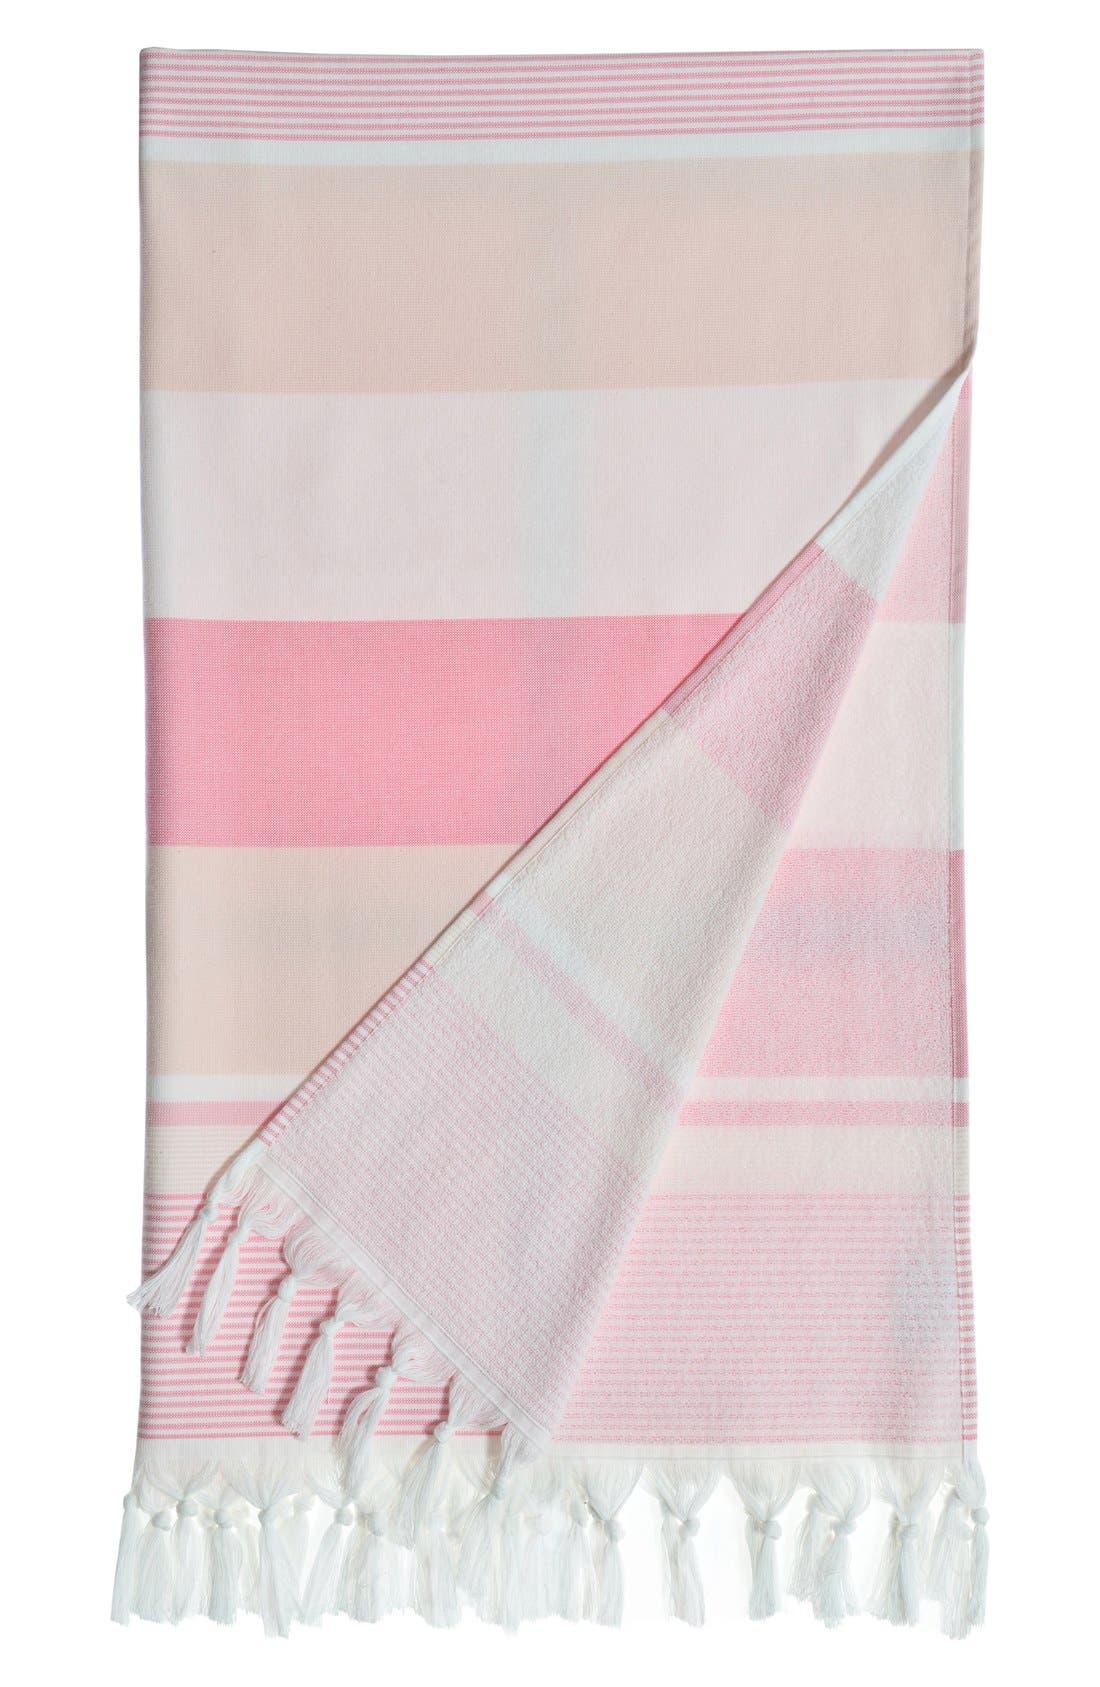 Linum Home Textiles 'Summer Loving' Turkish Pestemal Towel